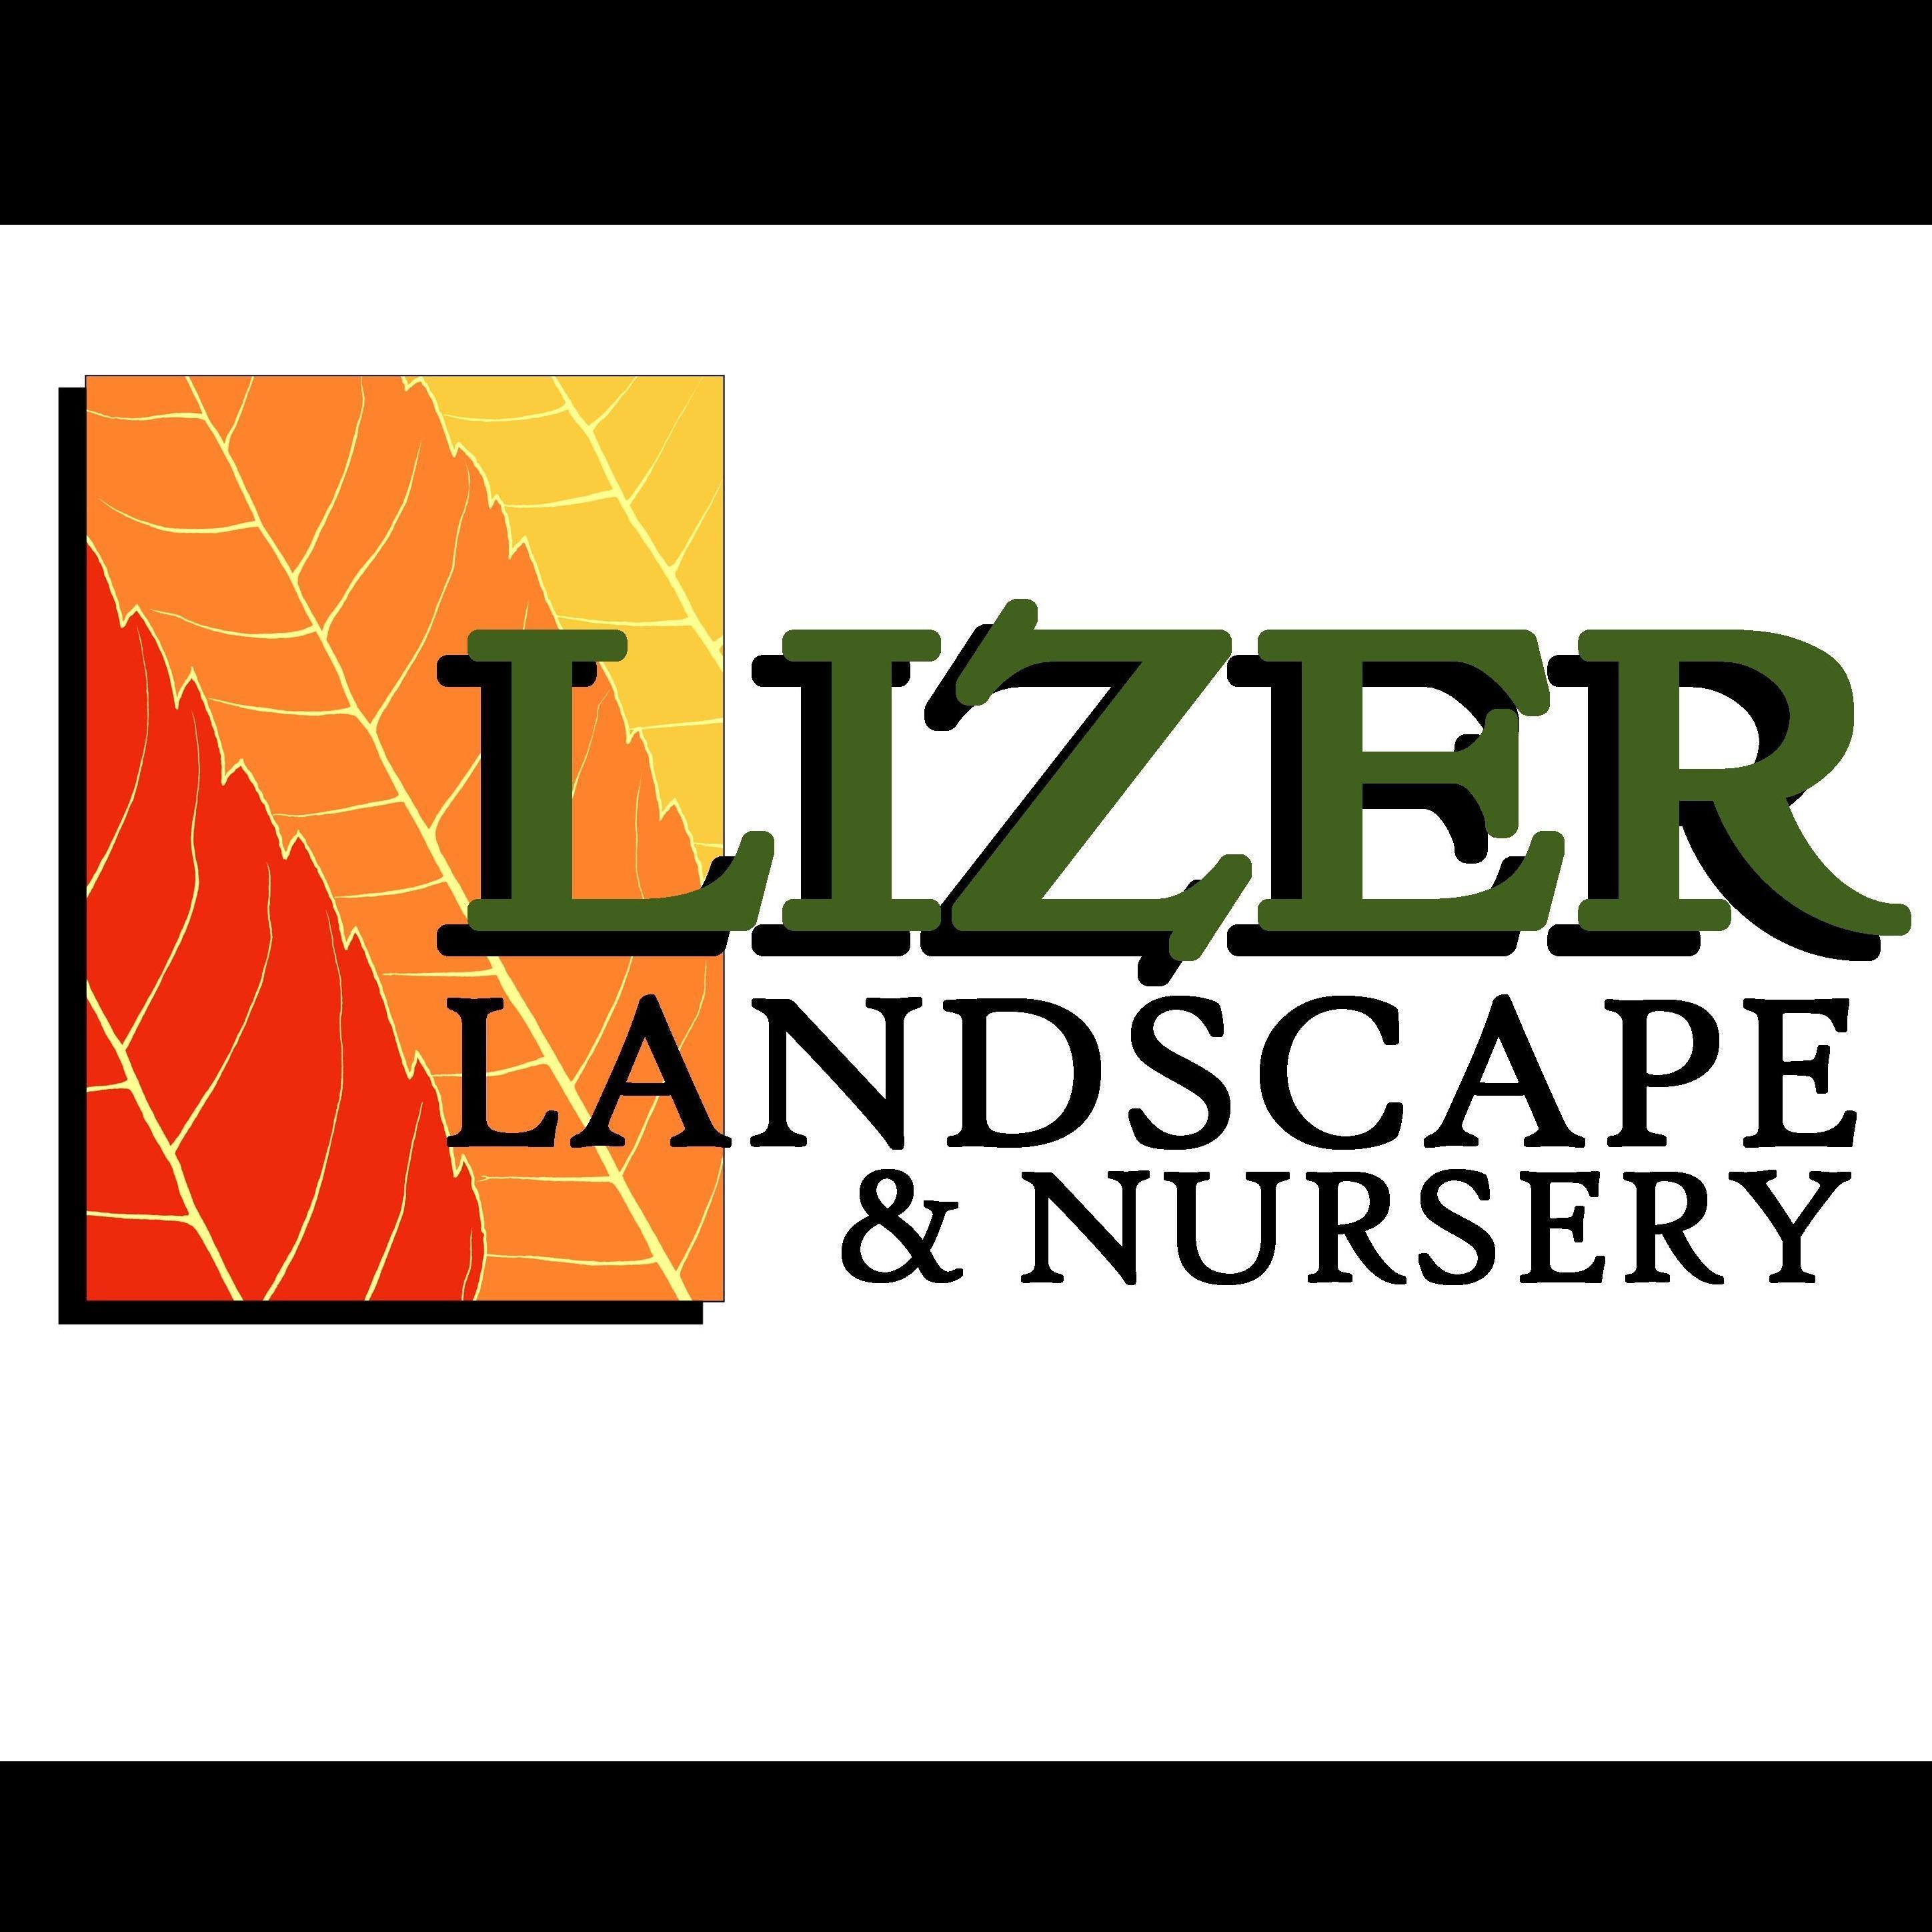 Lizer Landscape & Nursery image 0